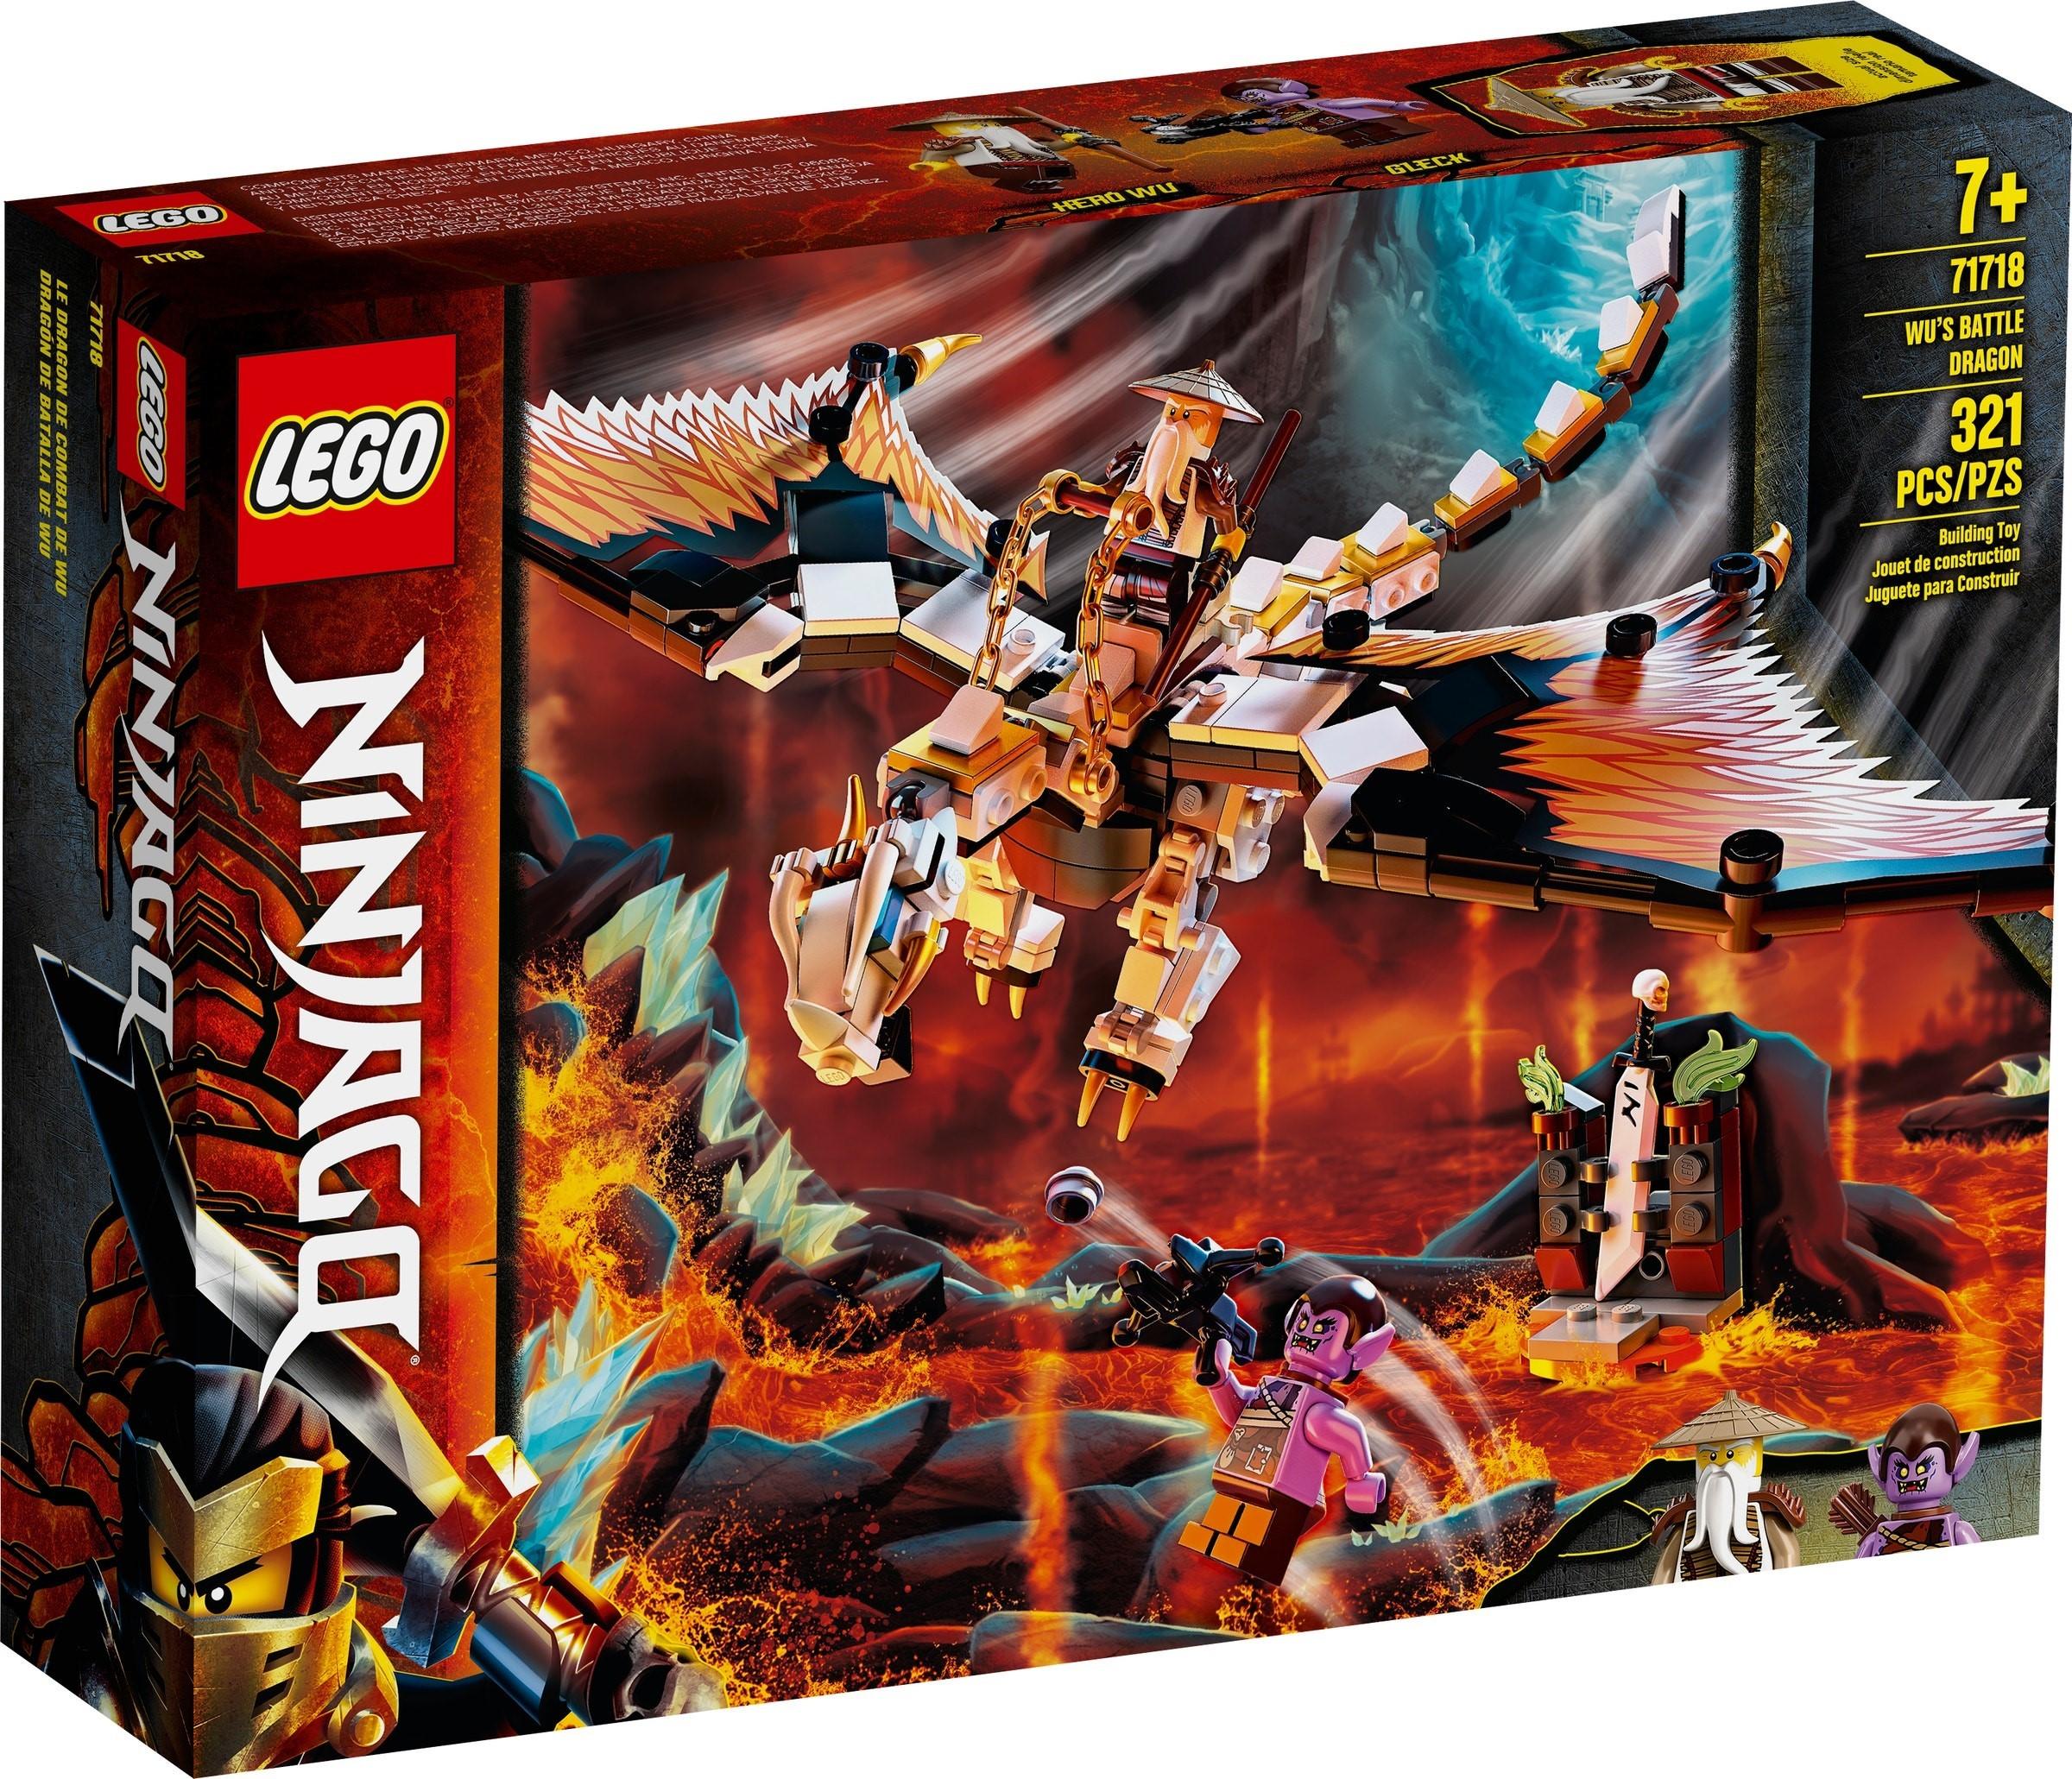 LEGO WU'S BATTLE DRAGON - 71718 • Thomas Moore